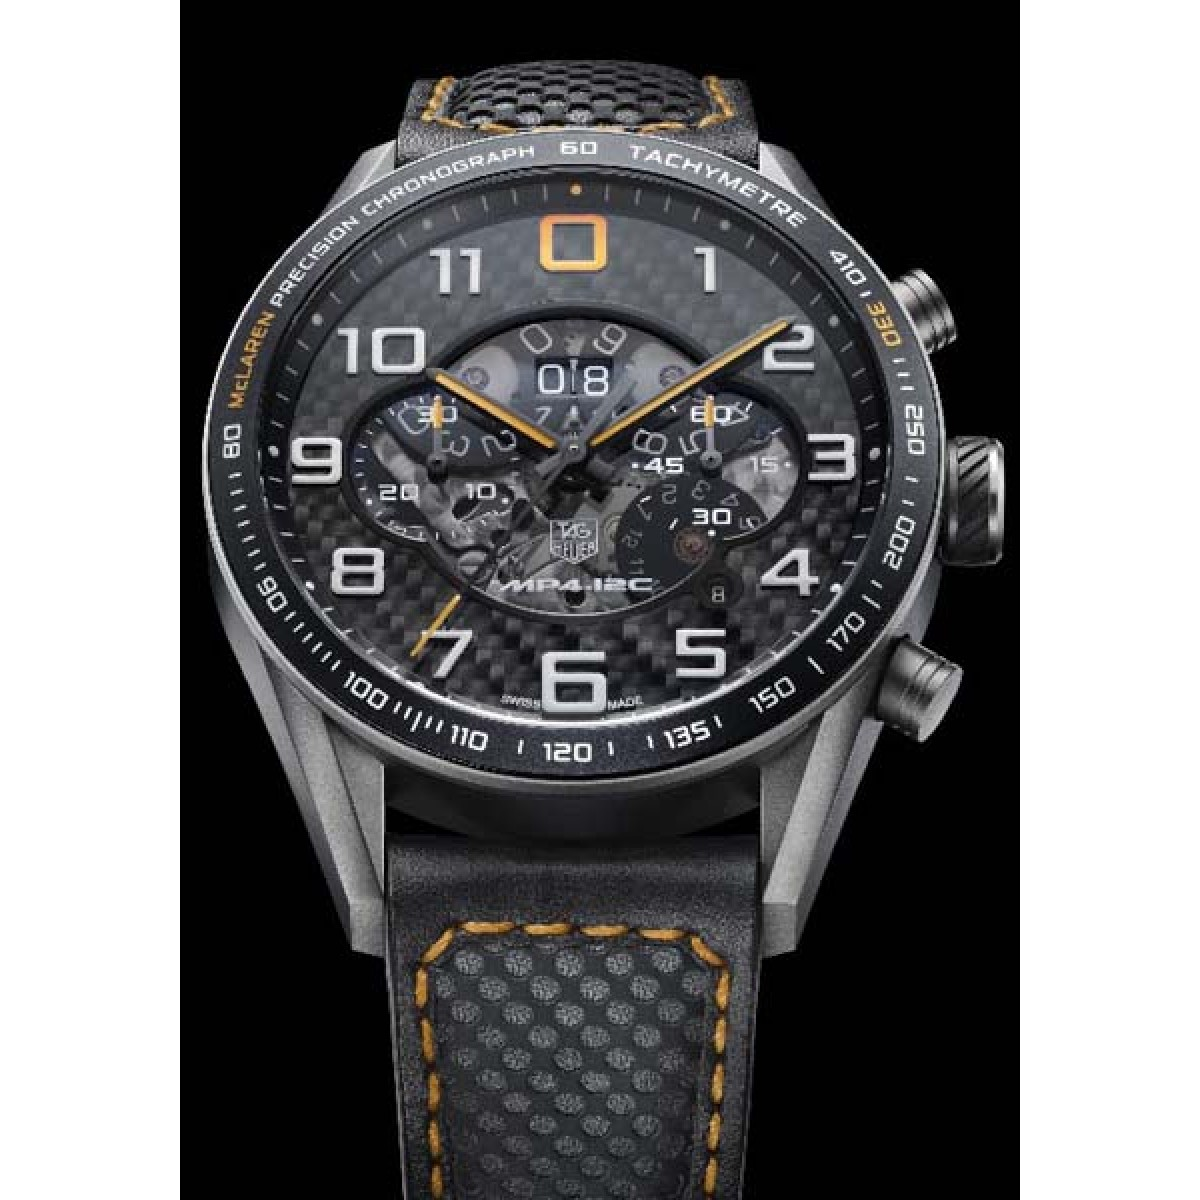 9370f6688fd Relógio Réplica Tag Heuer Mp4-12C